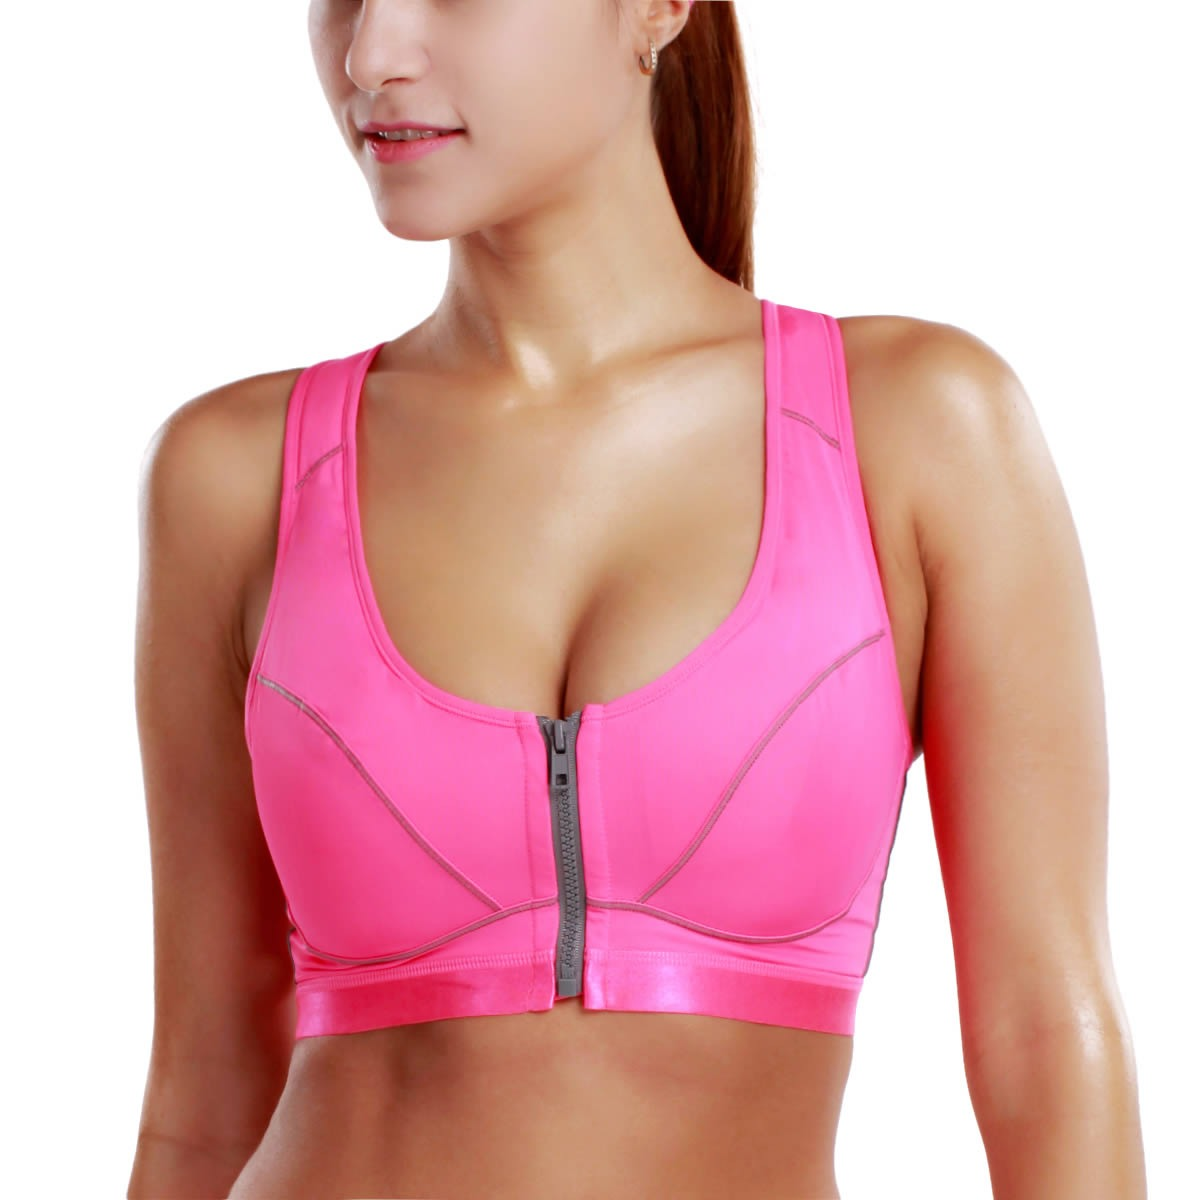 Aliexpress.com : Buy High Impact Women's Level 3 Front Zip ...